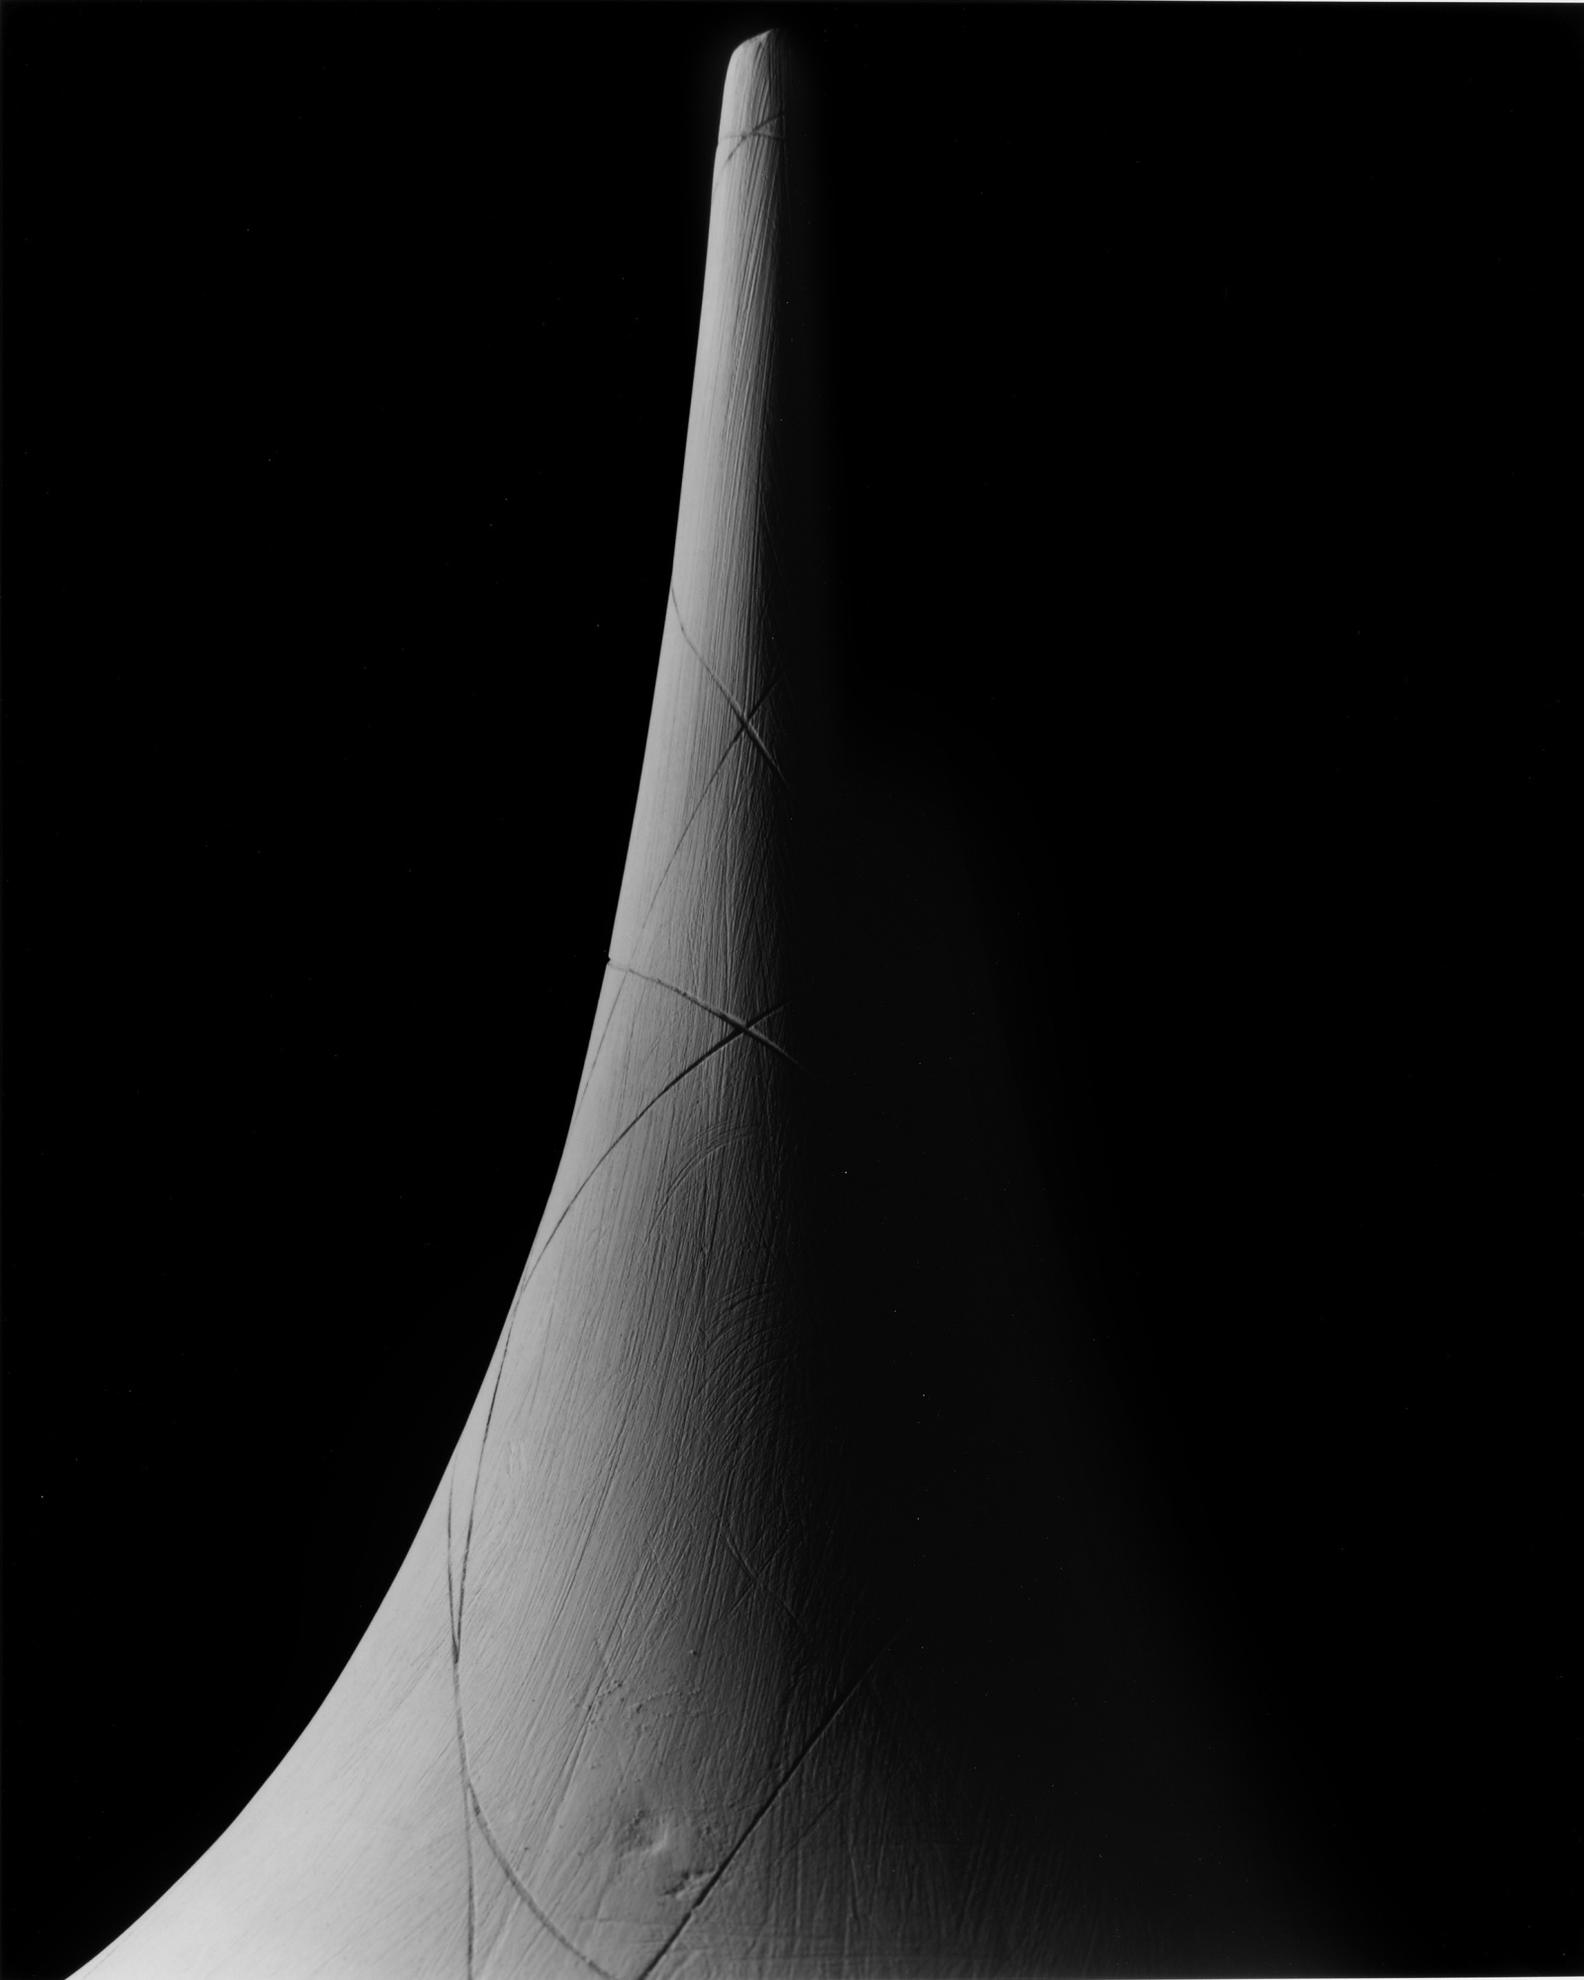 Hiroshi Sugimoto-Mathematical Form: Surface 0010-2004